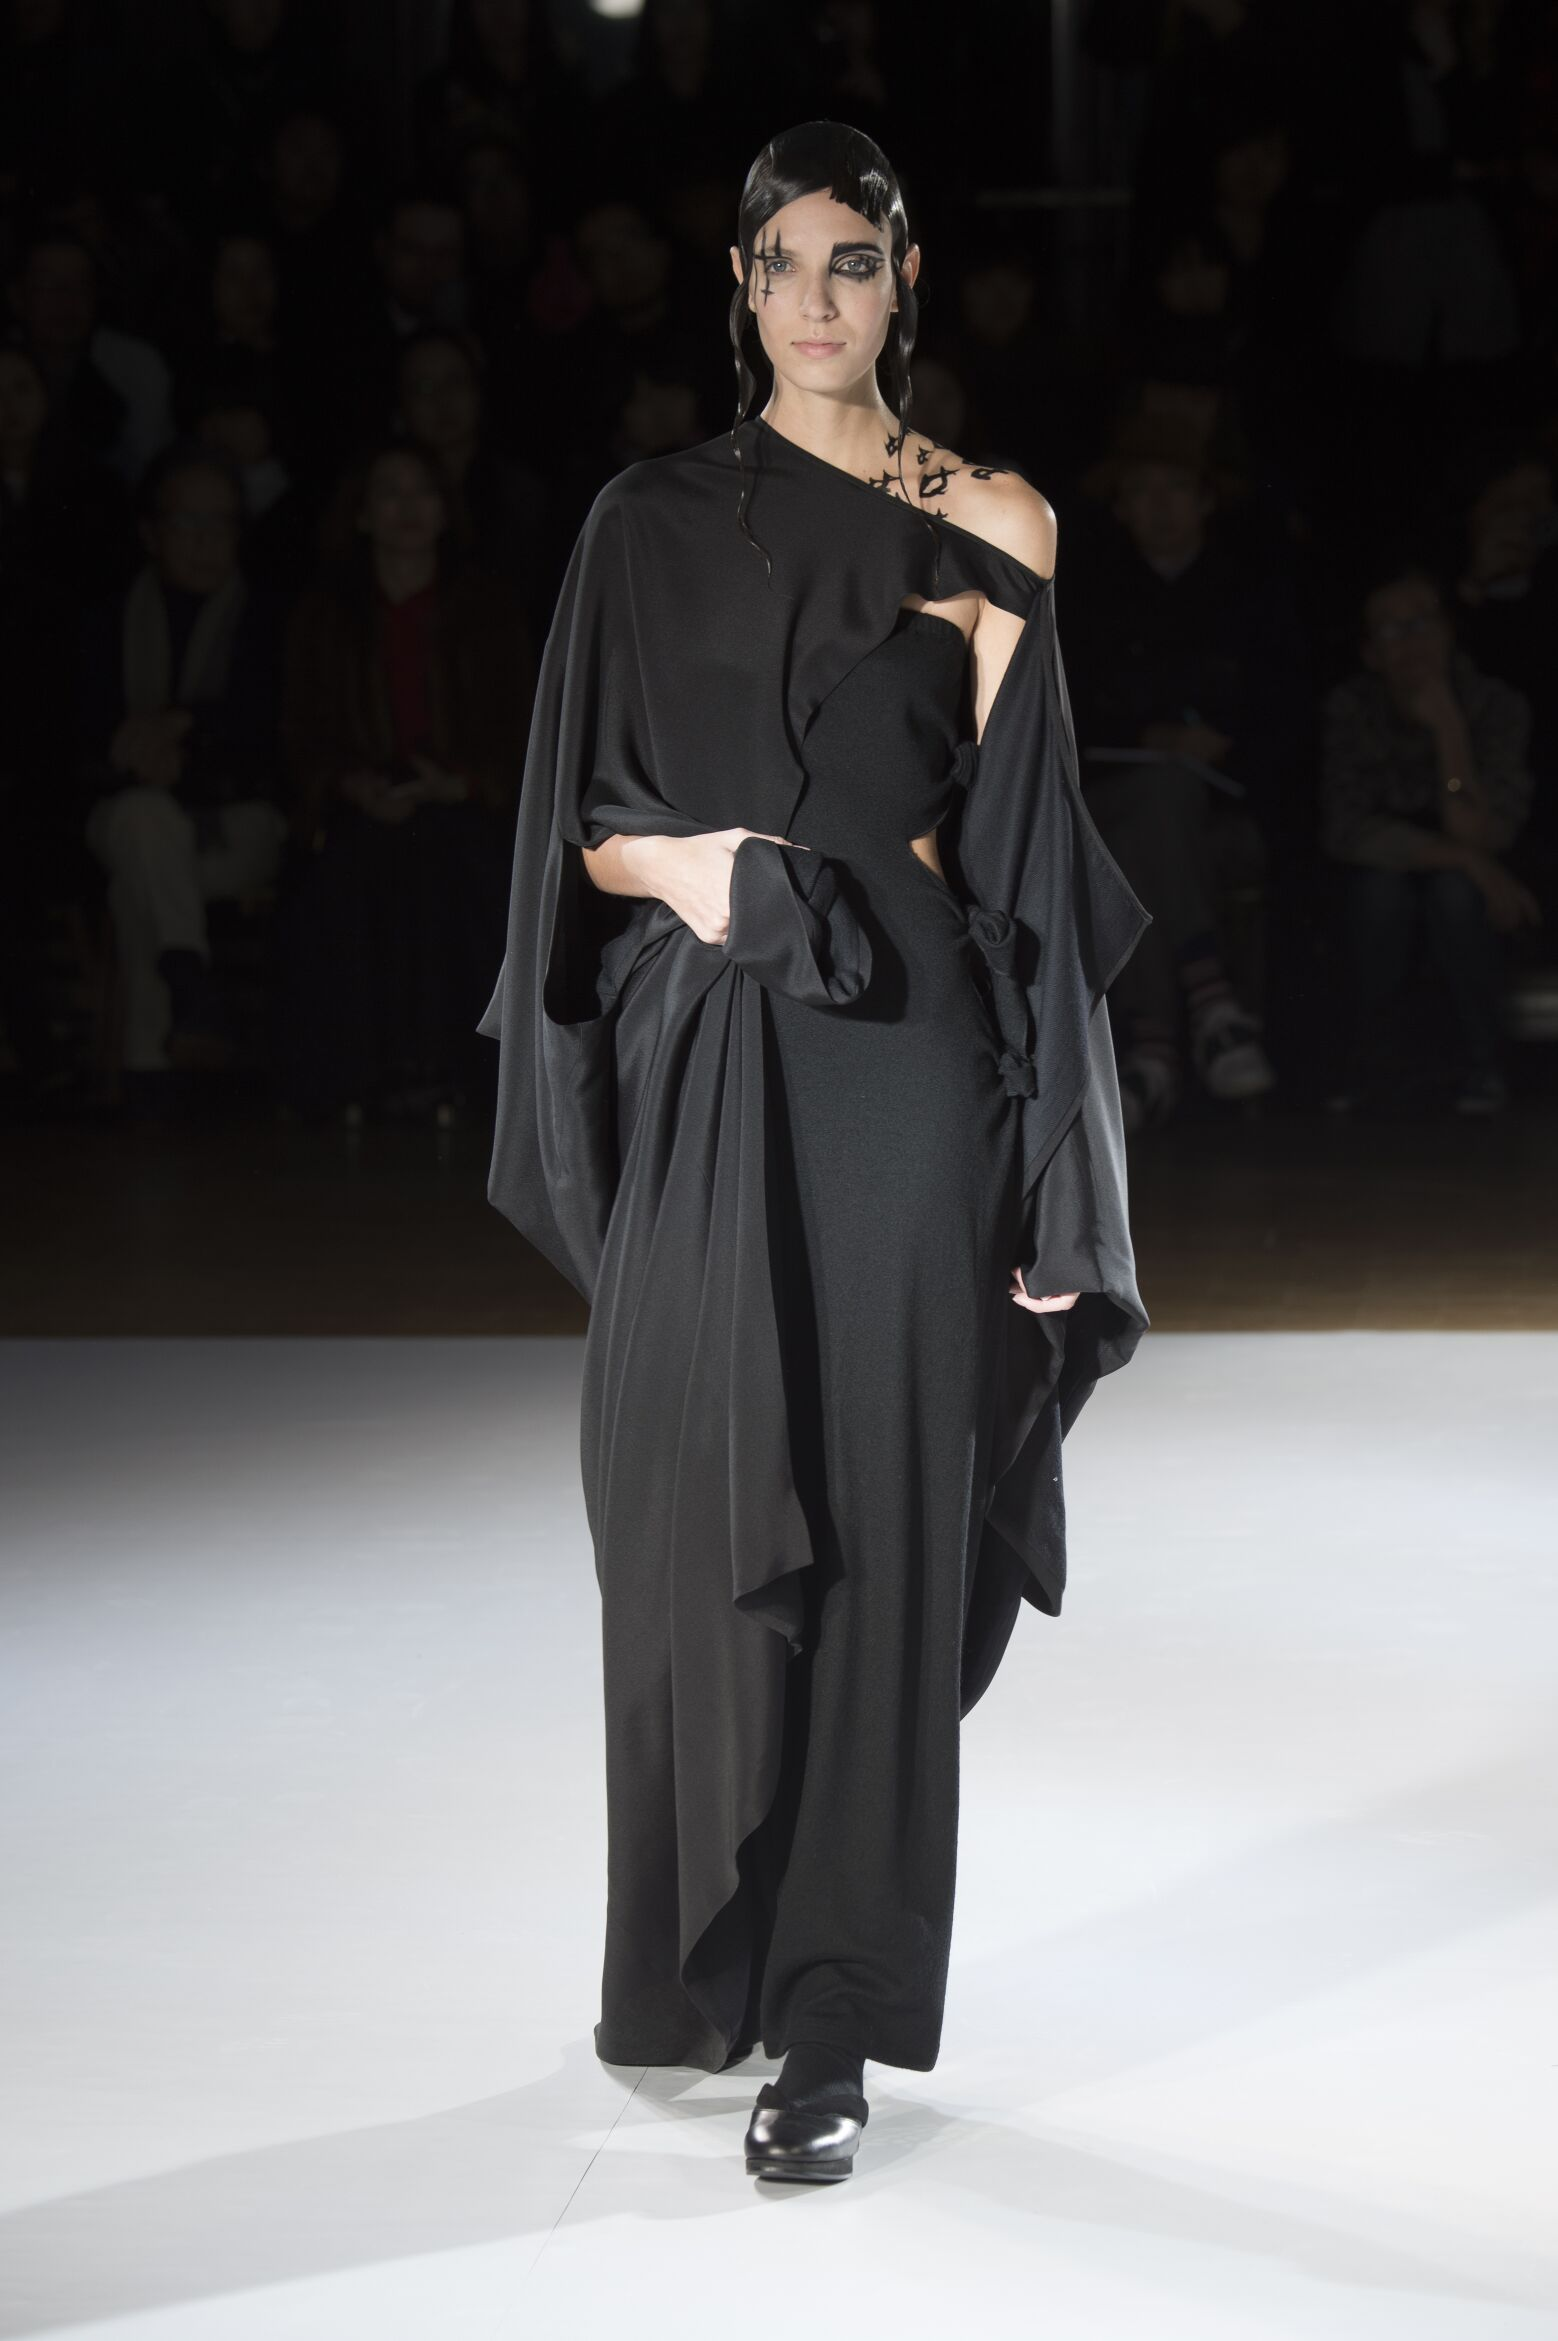 Catwalk Yohji Yamamoto Fall Winter 2015 16 Women's Collection Paris Fashion Week